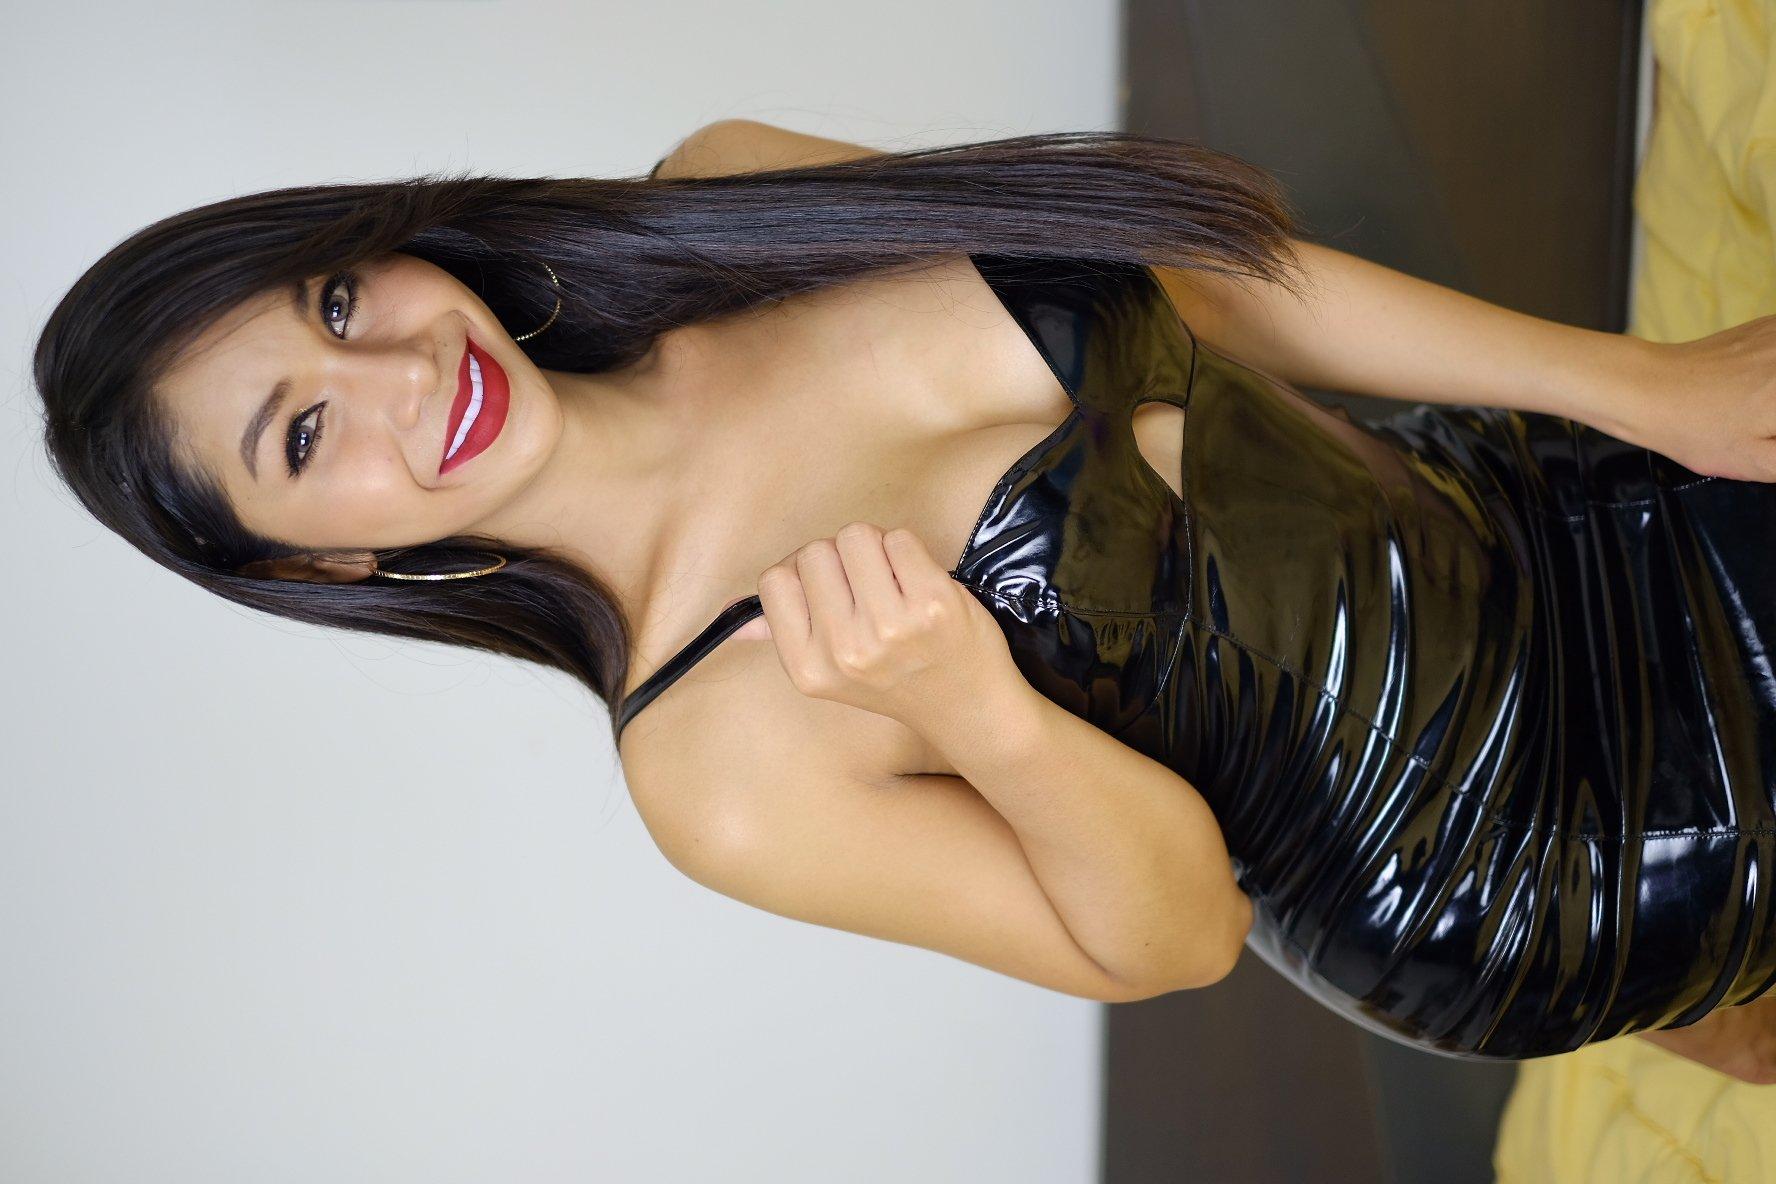 ts escort thailand escort girl website